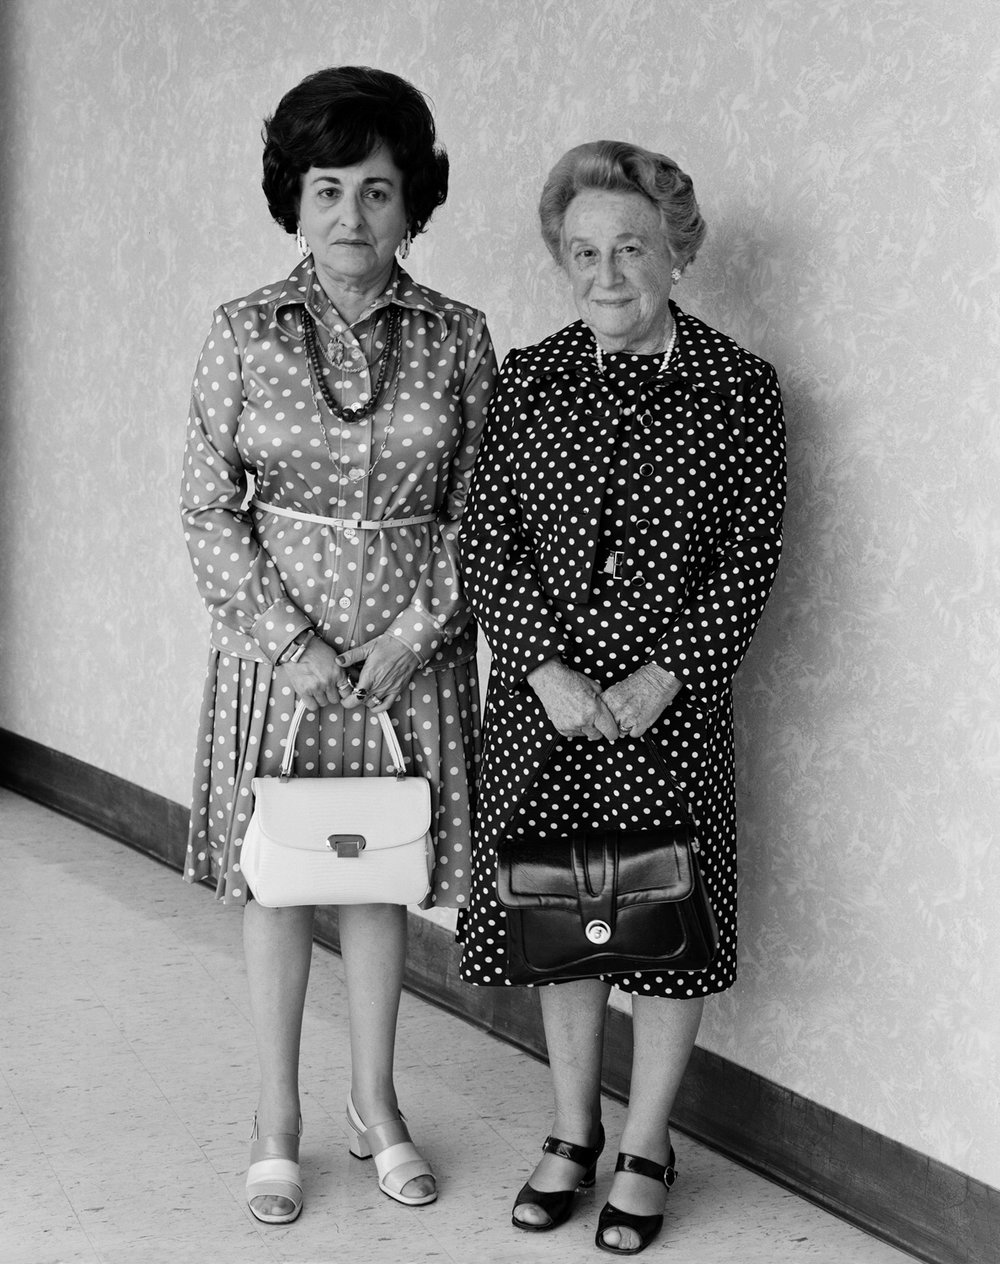 Polka Dots and Purses, Houston, TX, 1975